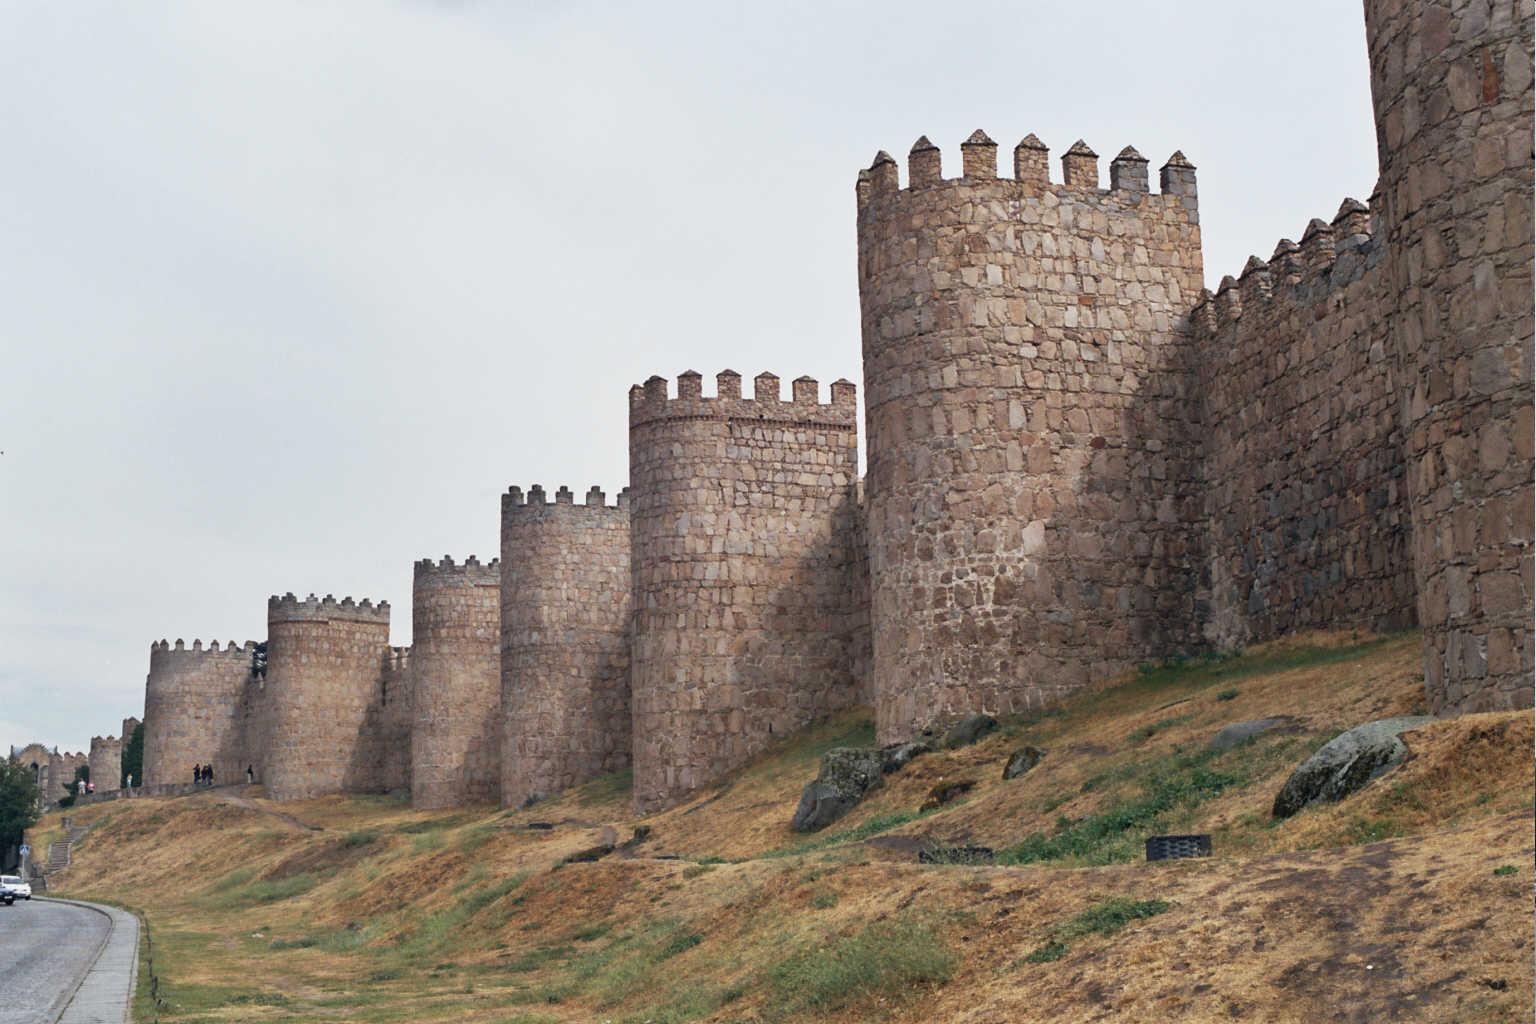 Muralla de Ávila - Wikipedia, la enciclopedia libre